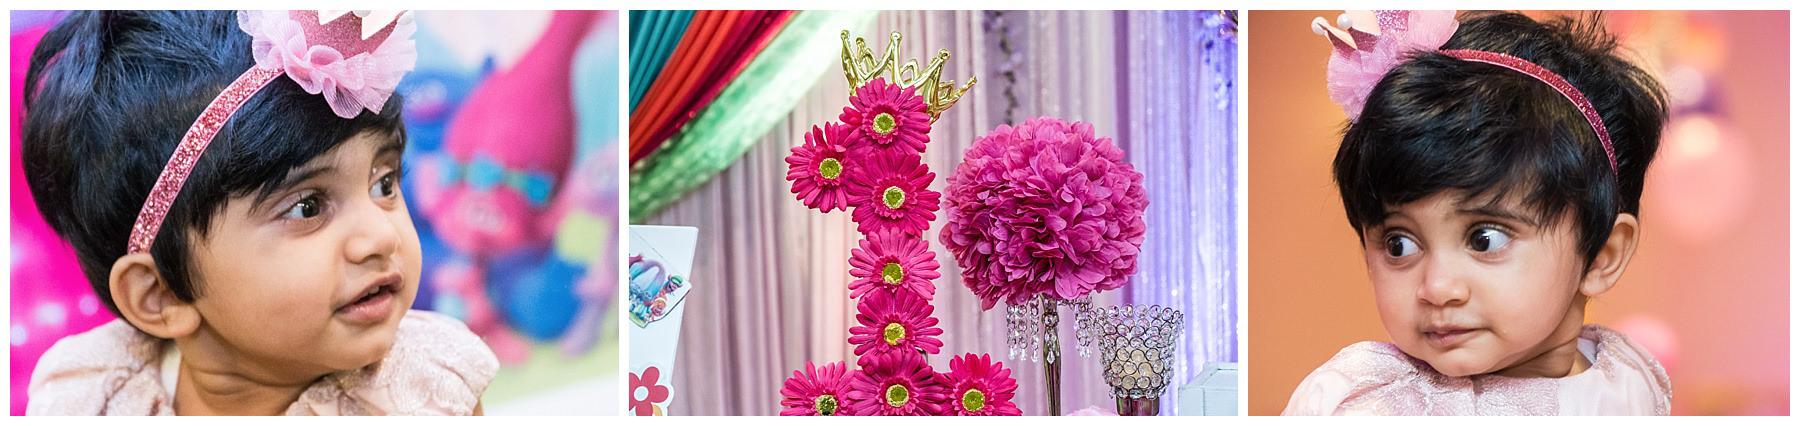 deewan-banquet-piscataway-nj-birthday-enanya-birthday-4.jpg